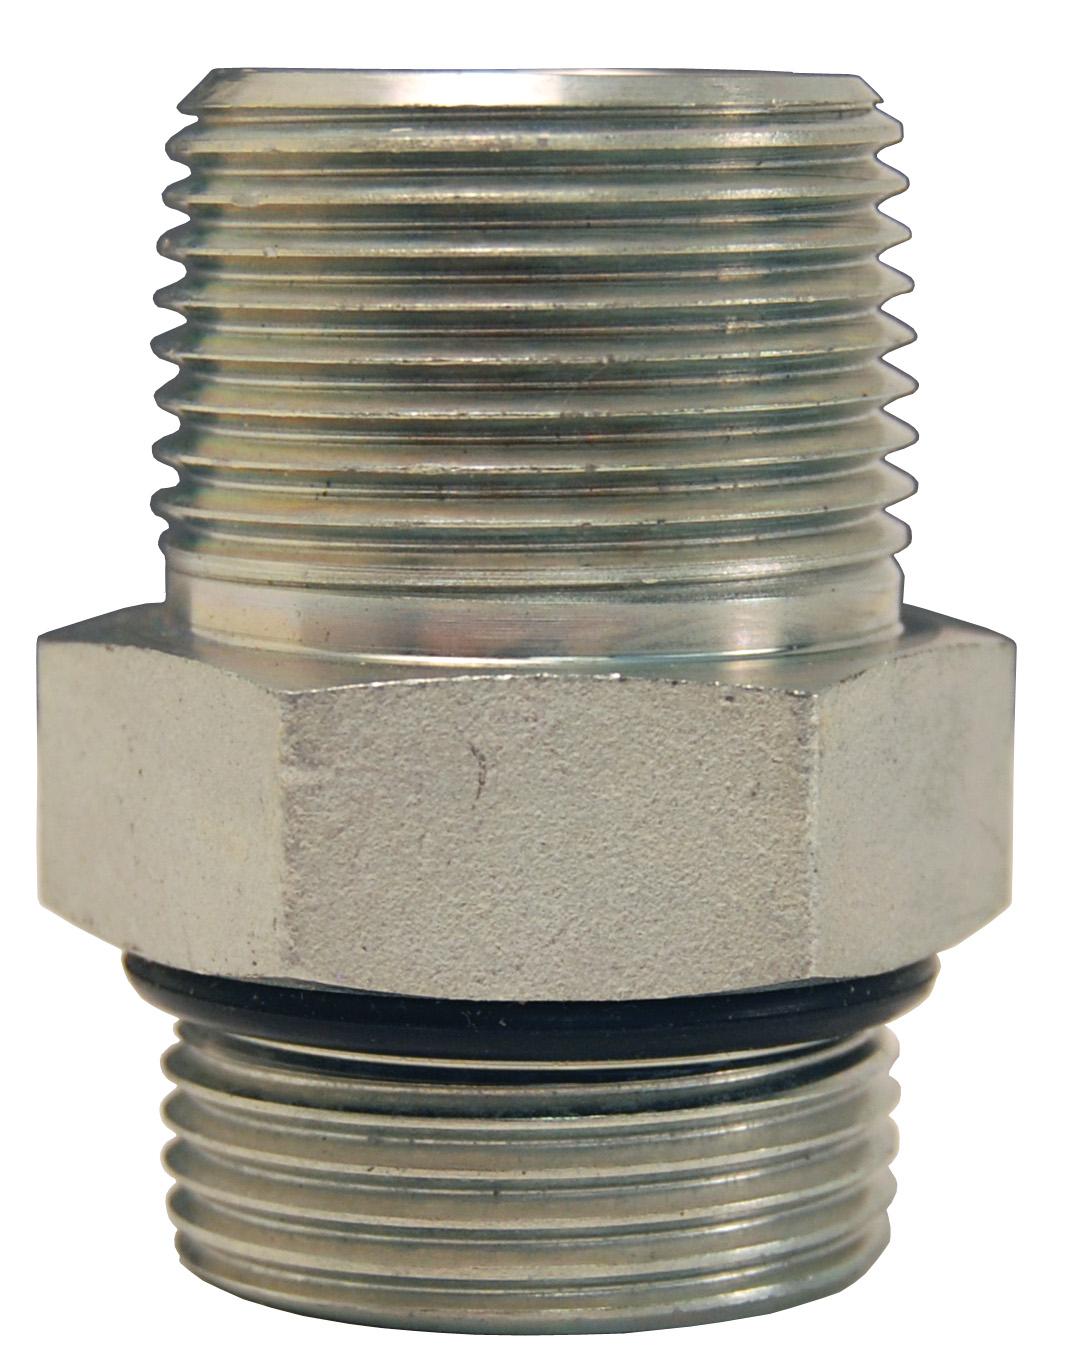 hydraulic fittings sae o-ring boss x male nptf adapters zinc plated steel